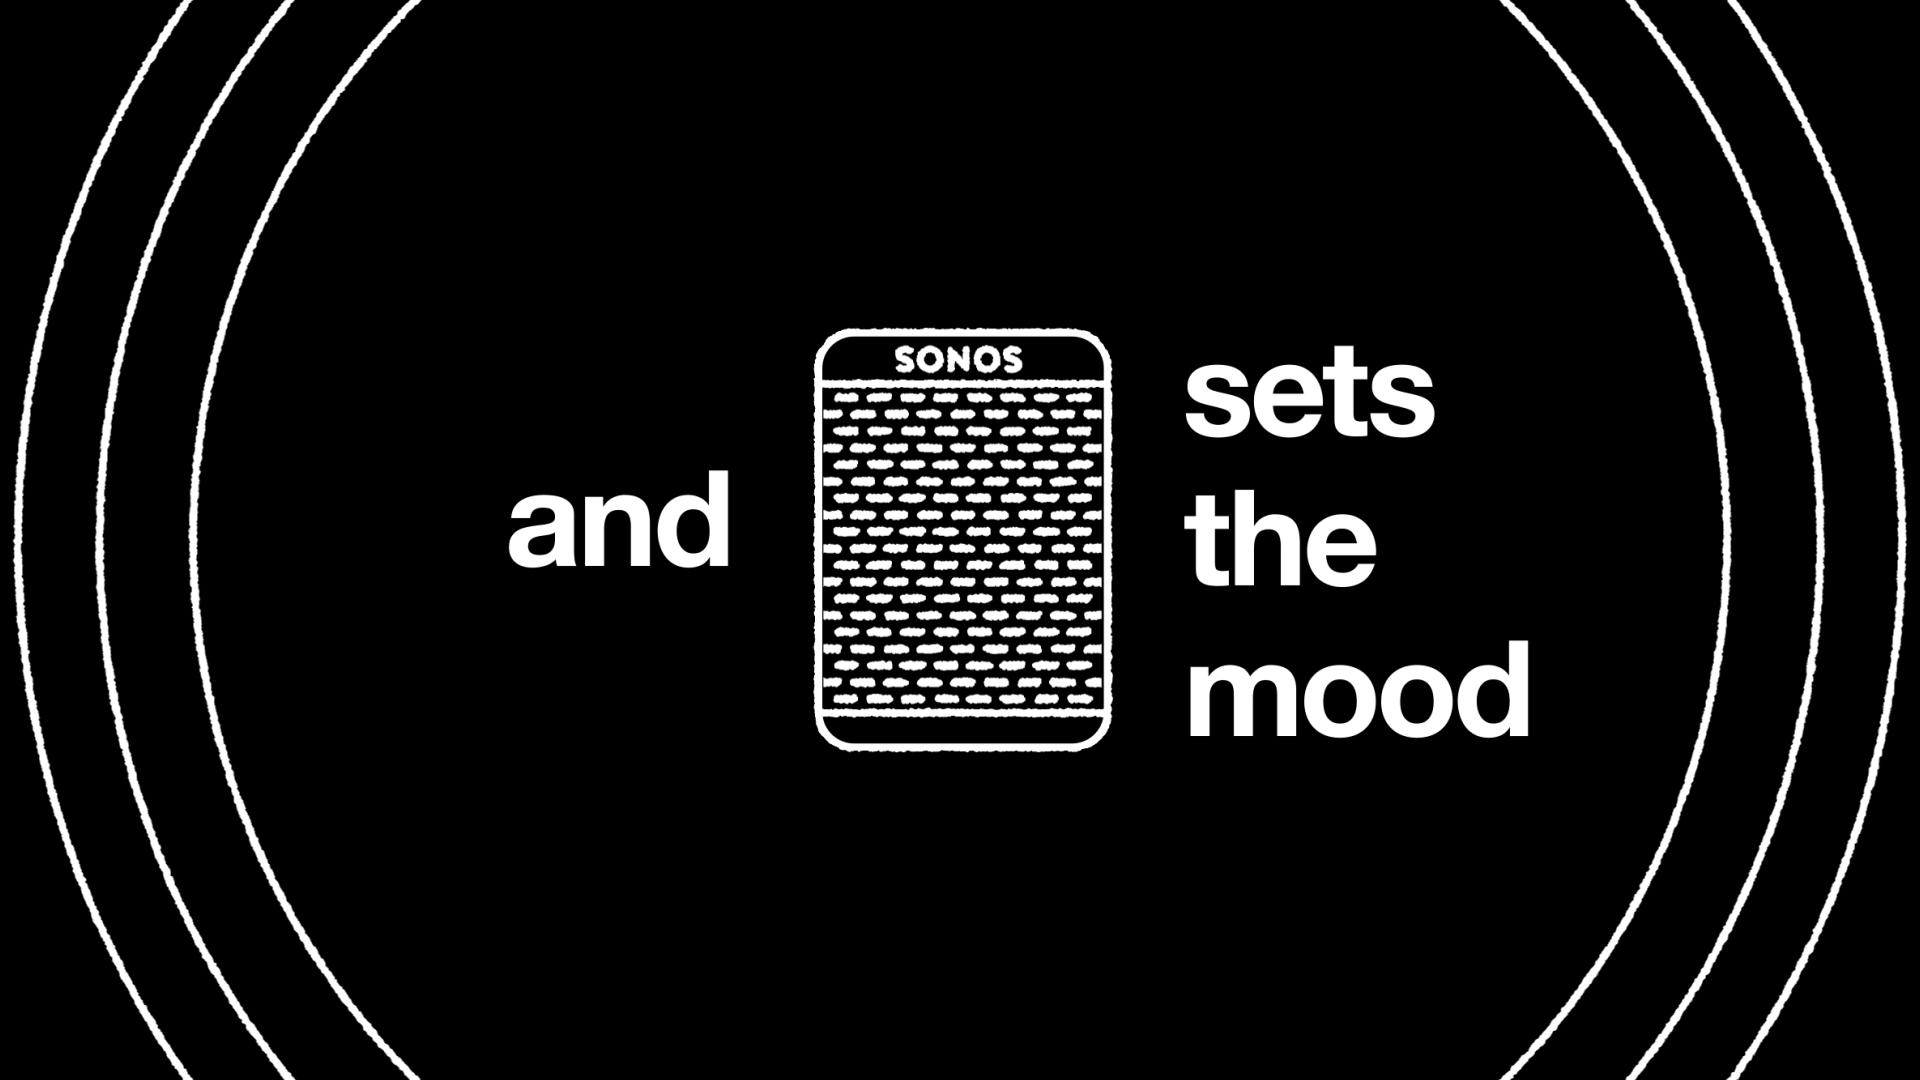 Sonos_WIP_16x9_1913.jpg